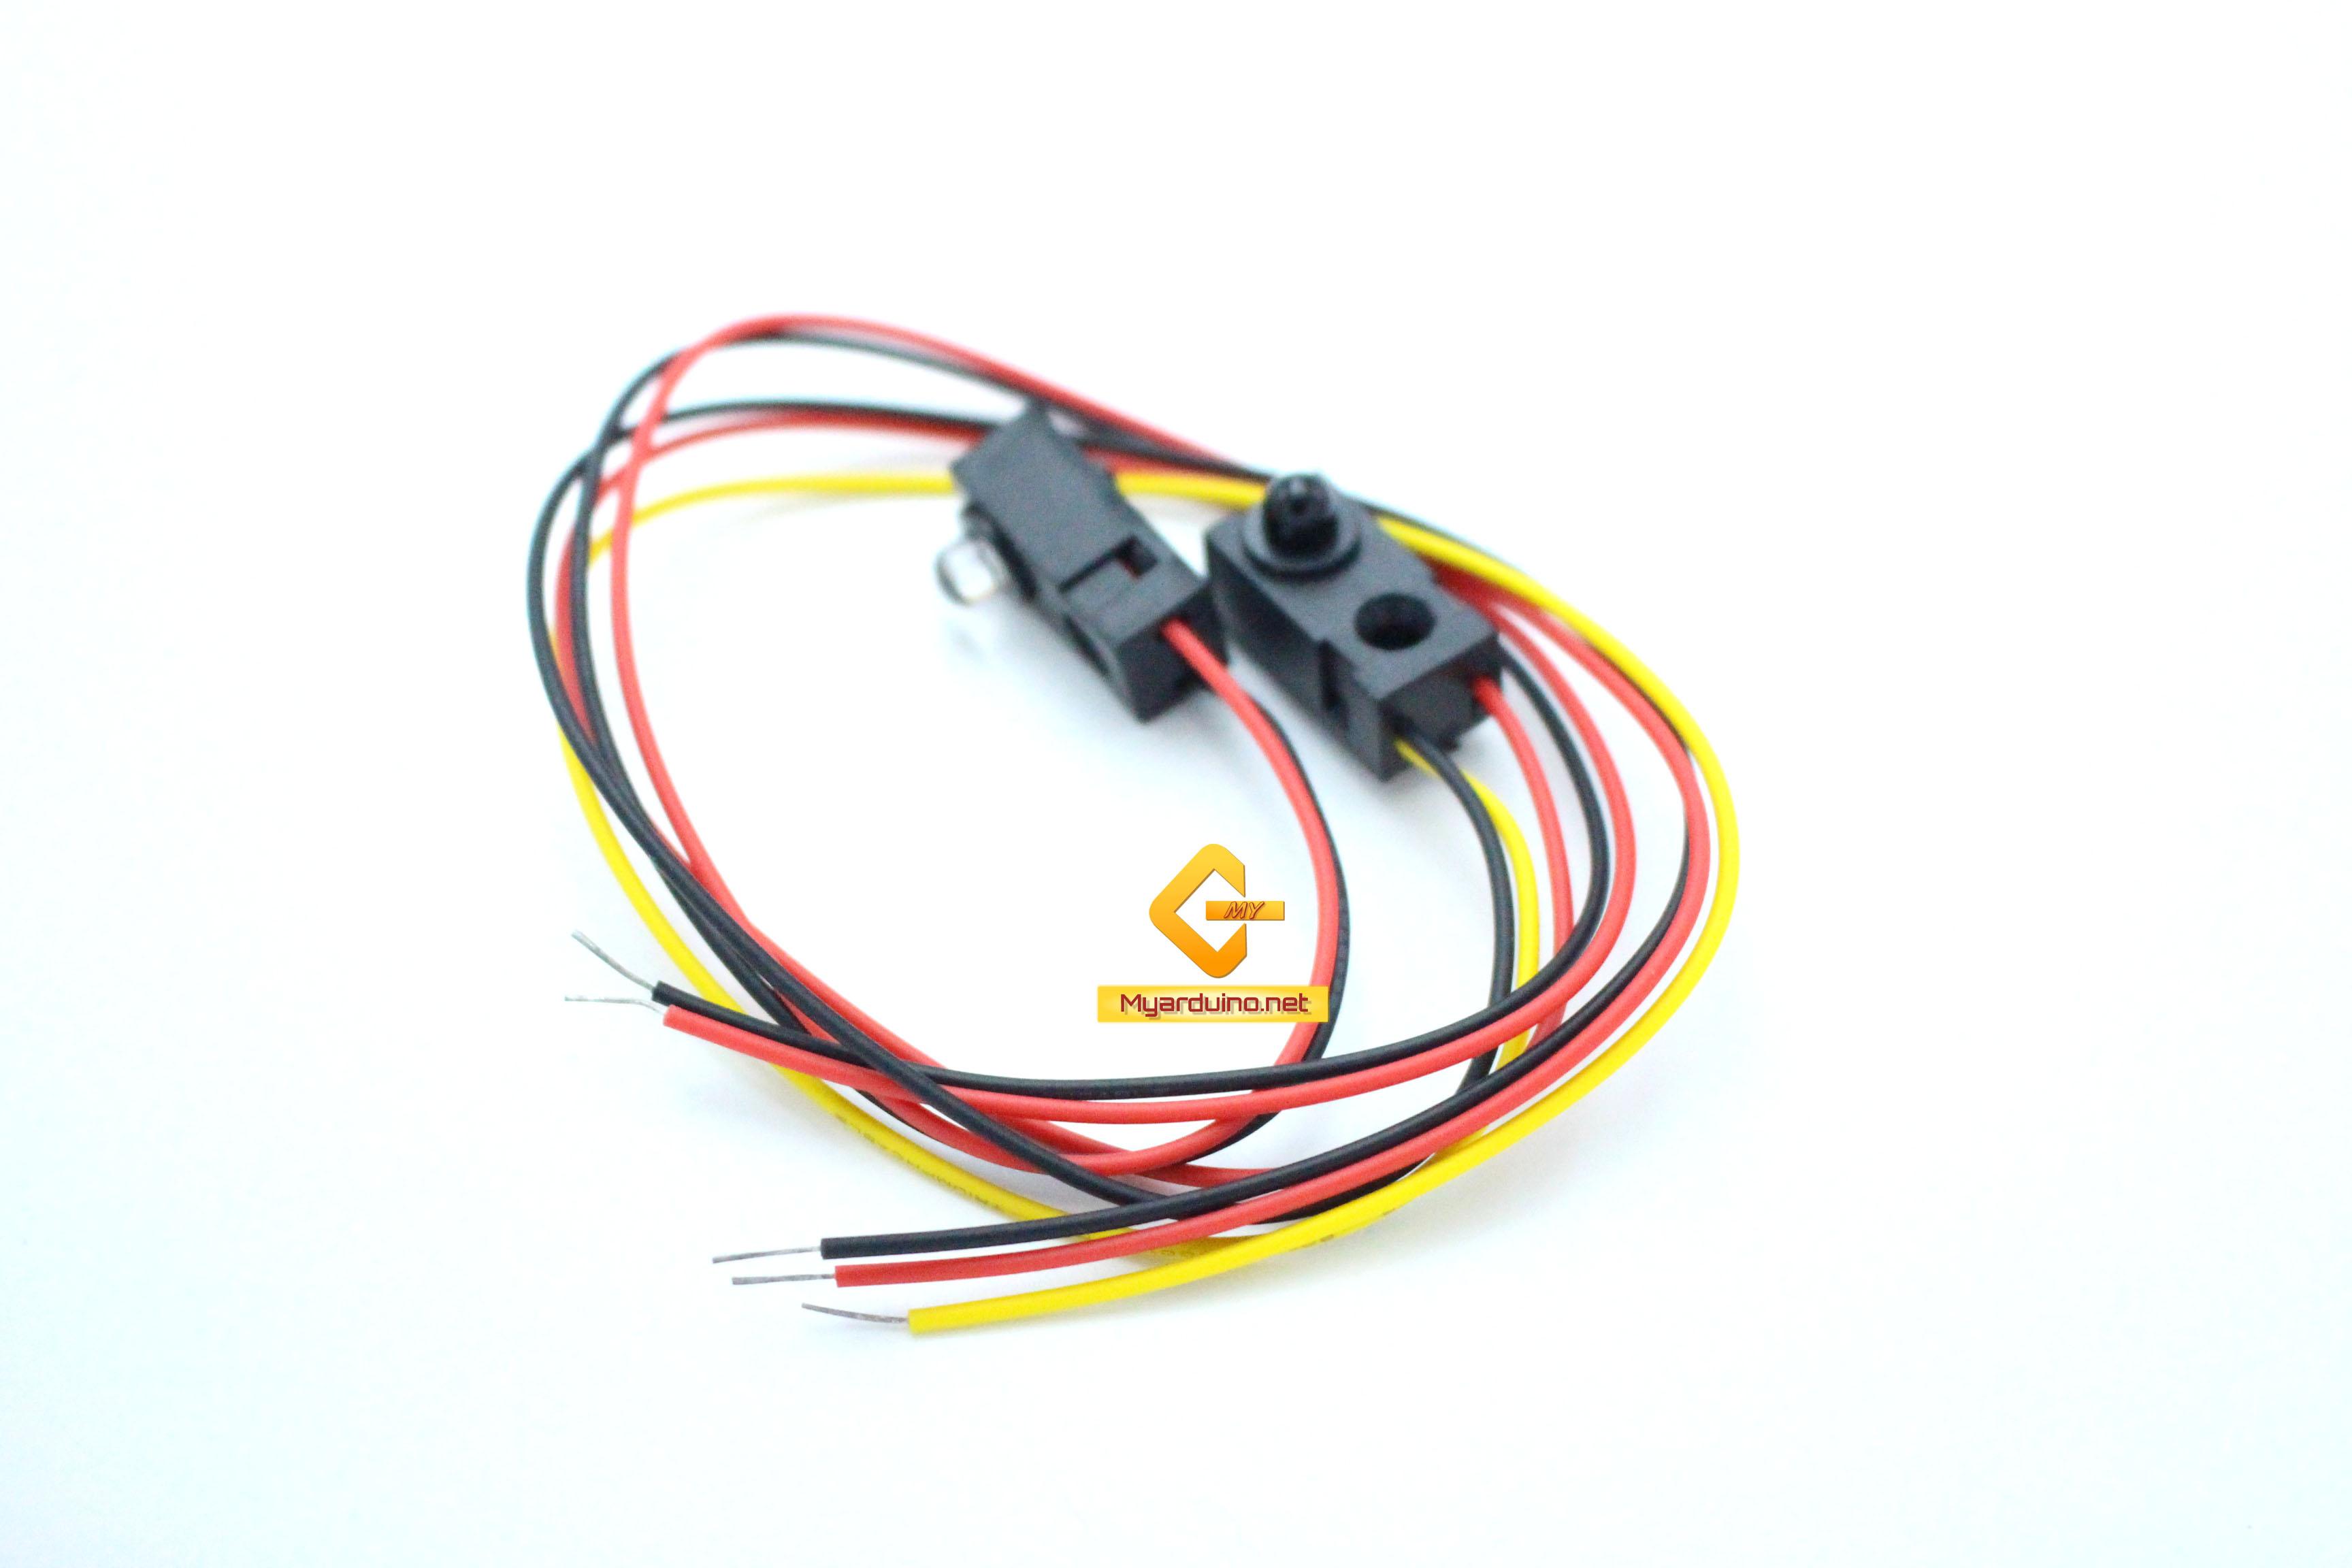 switch infrared sensor ตรวจจับวัตถุผ่าน 30cm